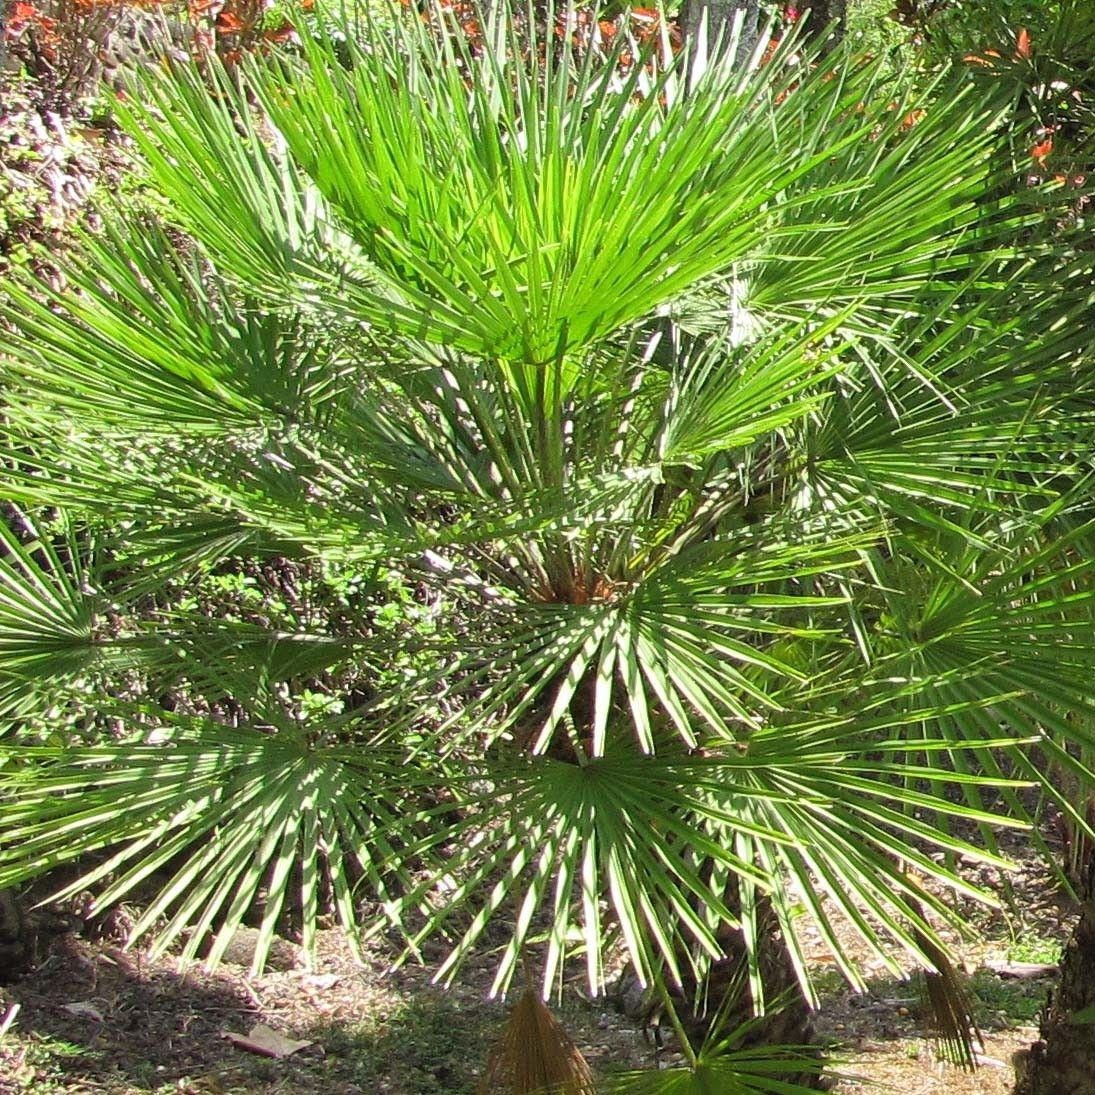 Chamaerops Humilis Palmier Eventail Palmier Nain De